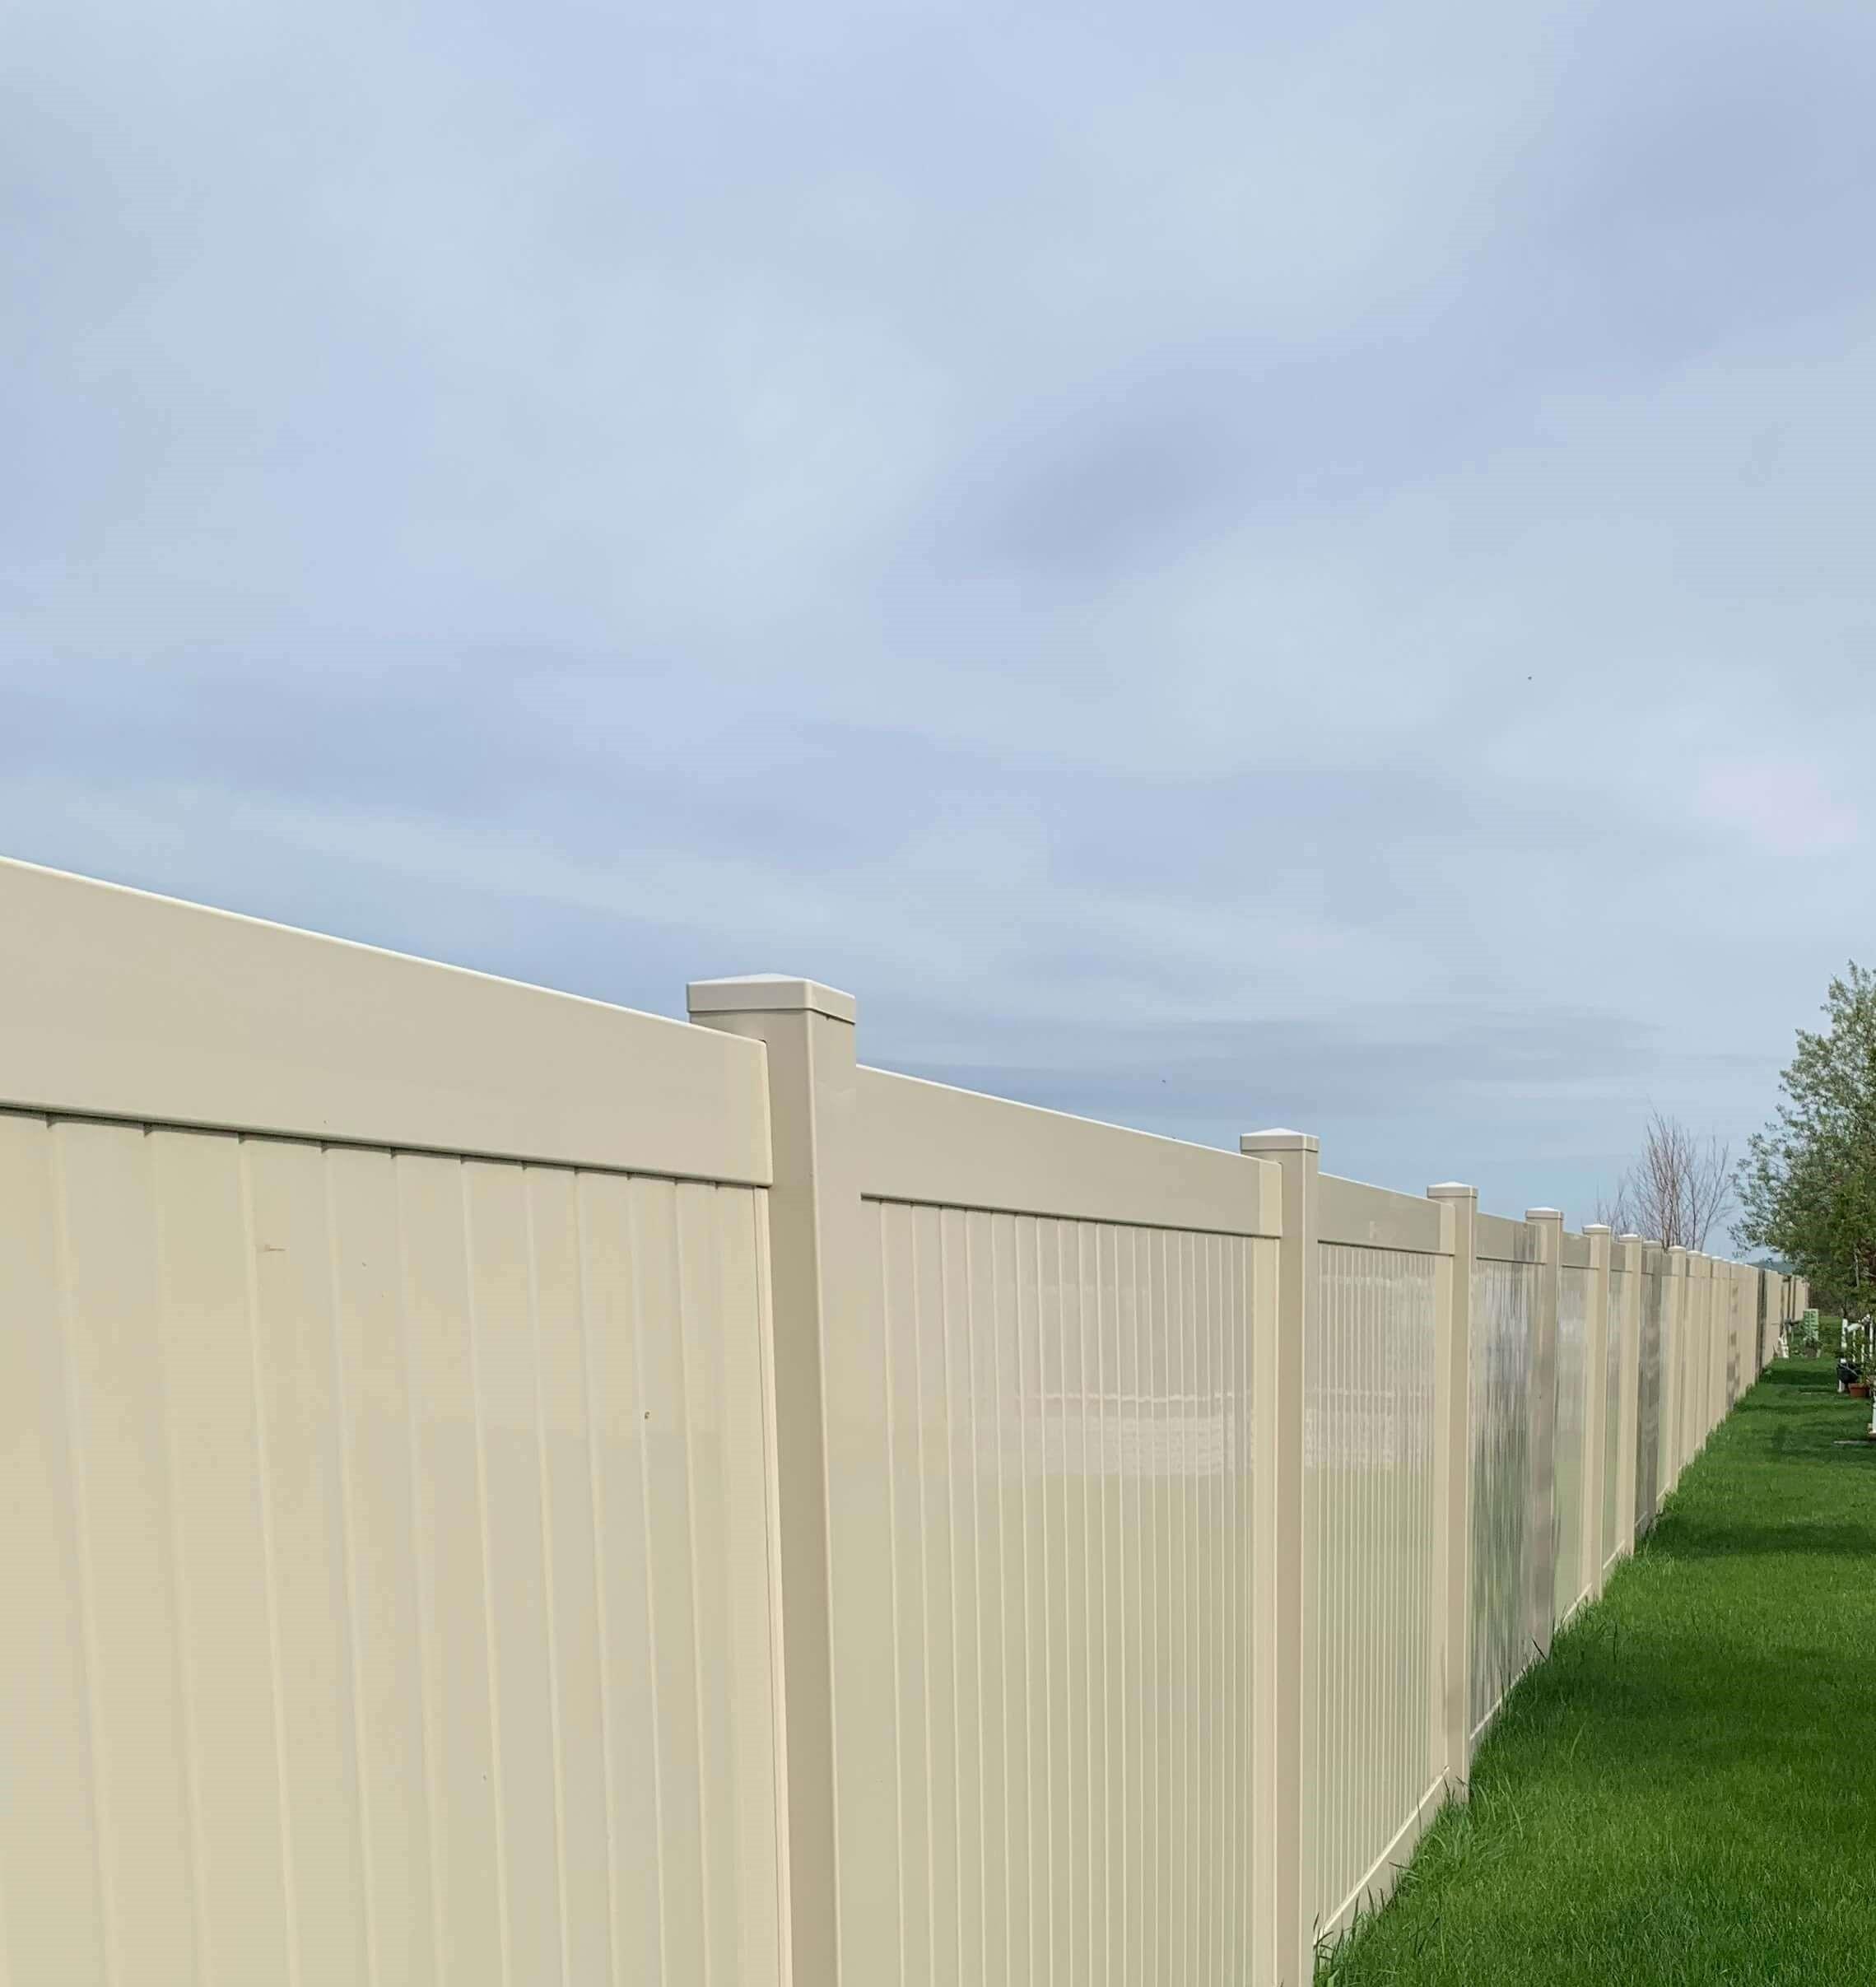 Almond fence